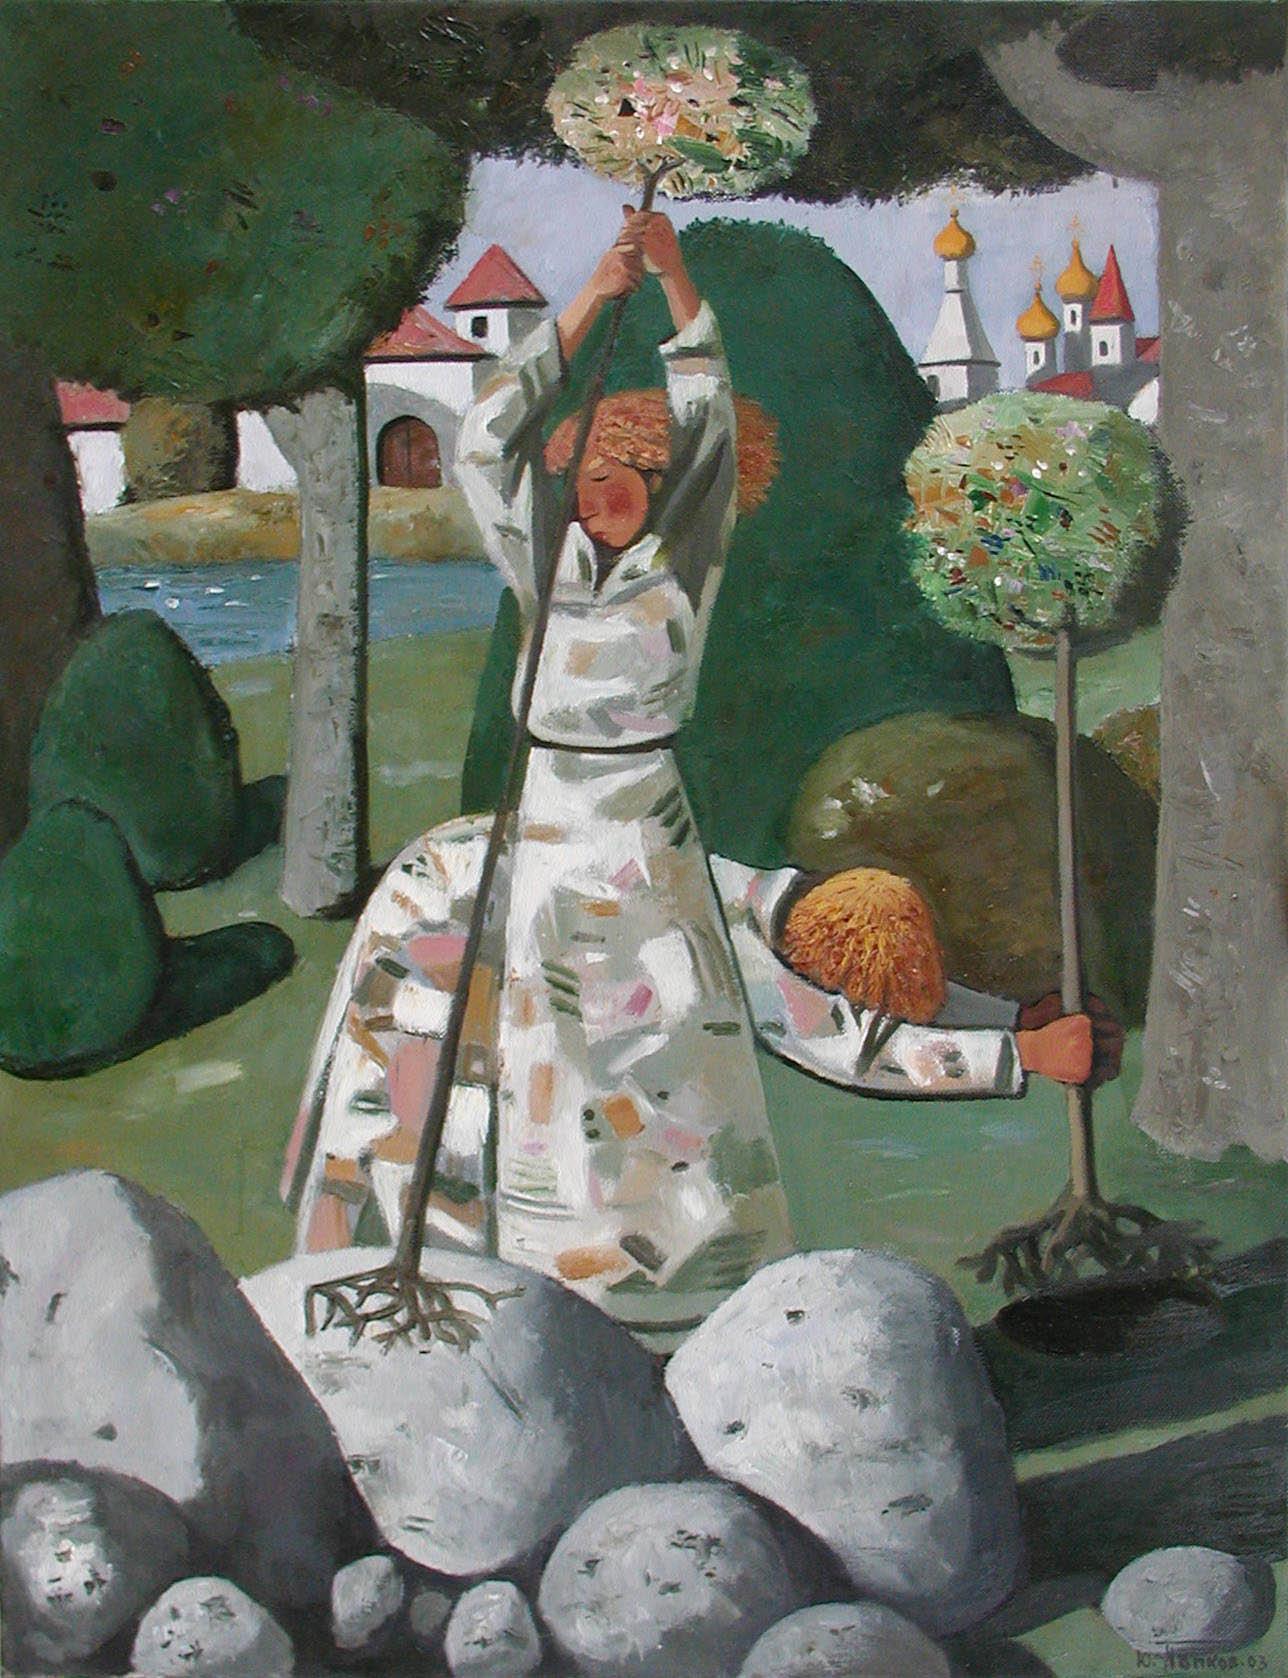 Ю.Н. Попков. Картина : Сажающая и втыкающий. 2003 г. Х., м. 110х90